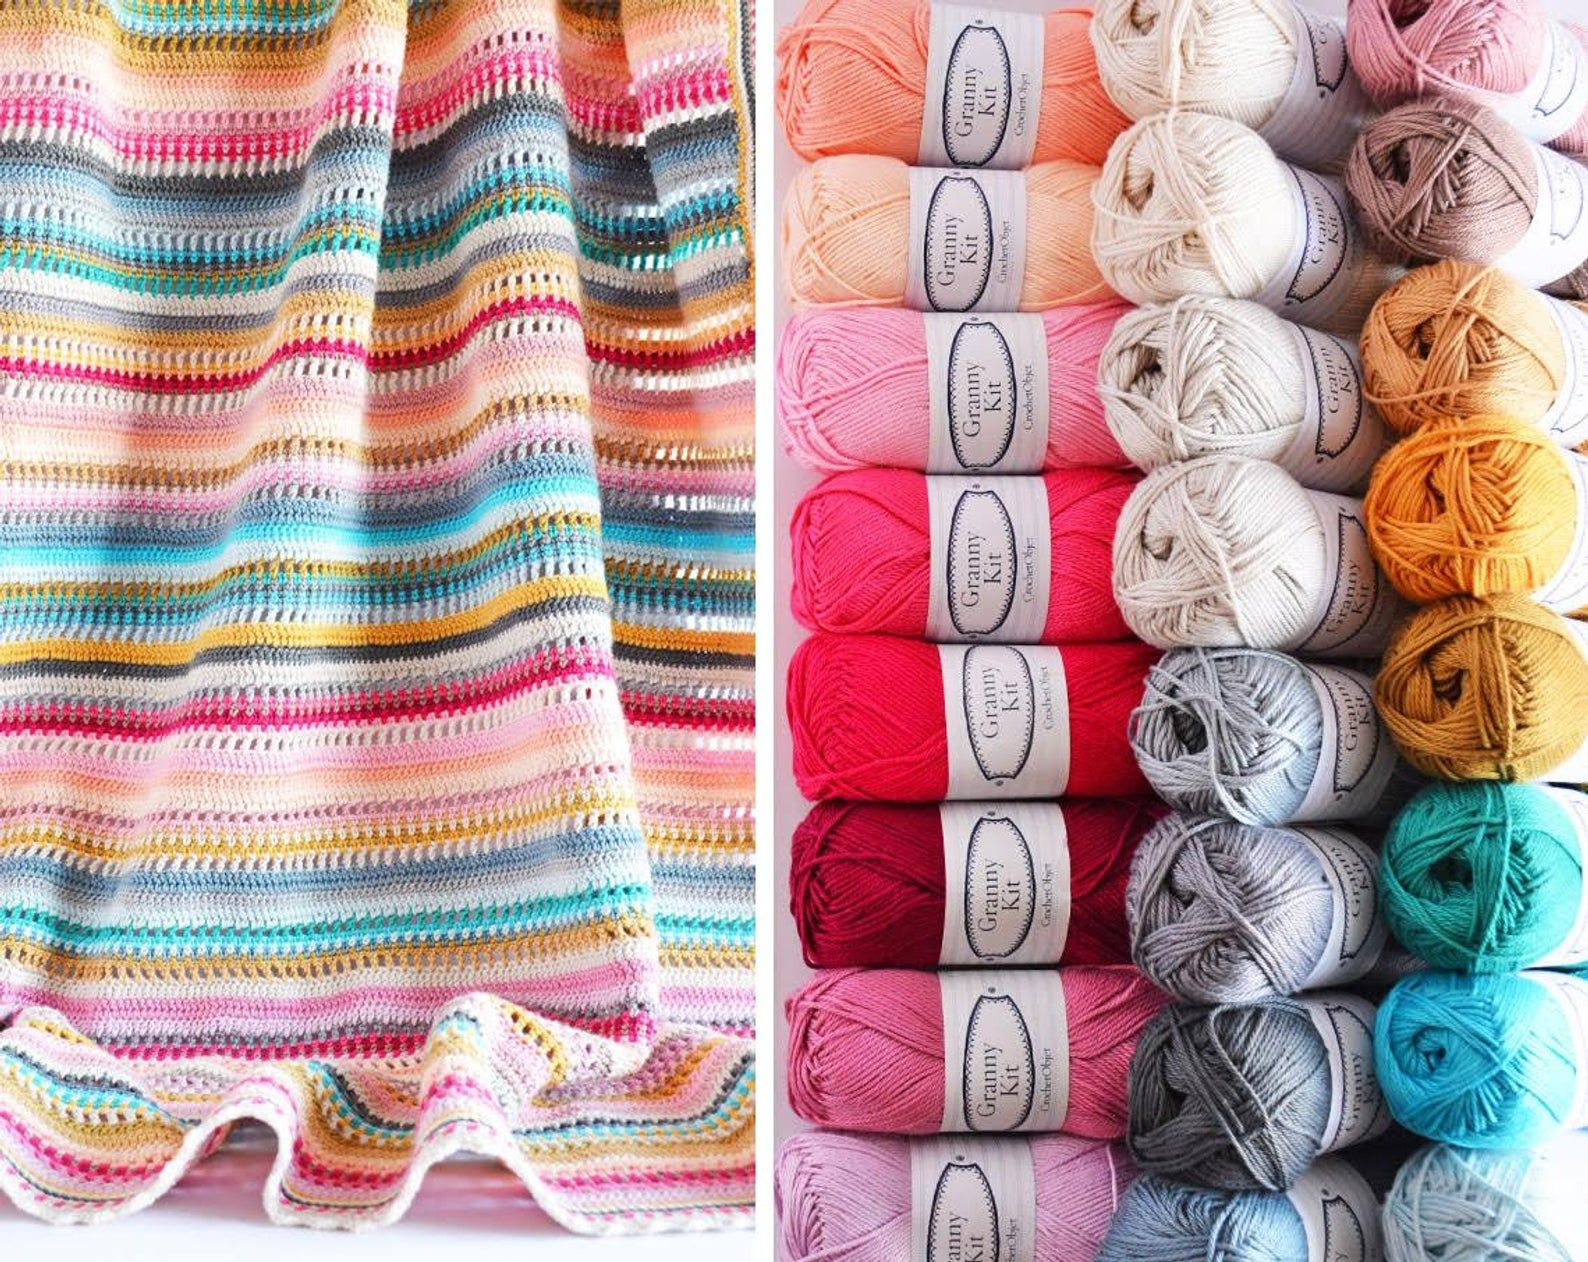 Free Shipping Cotton Yarn Pack Crochet Blanket Stripes And Etsy Crochet Blanket Striped Crochet Blanket Crochet Blanket Patterns